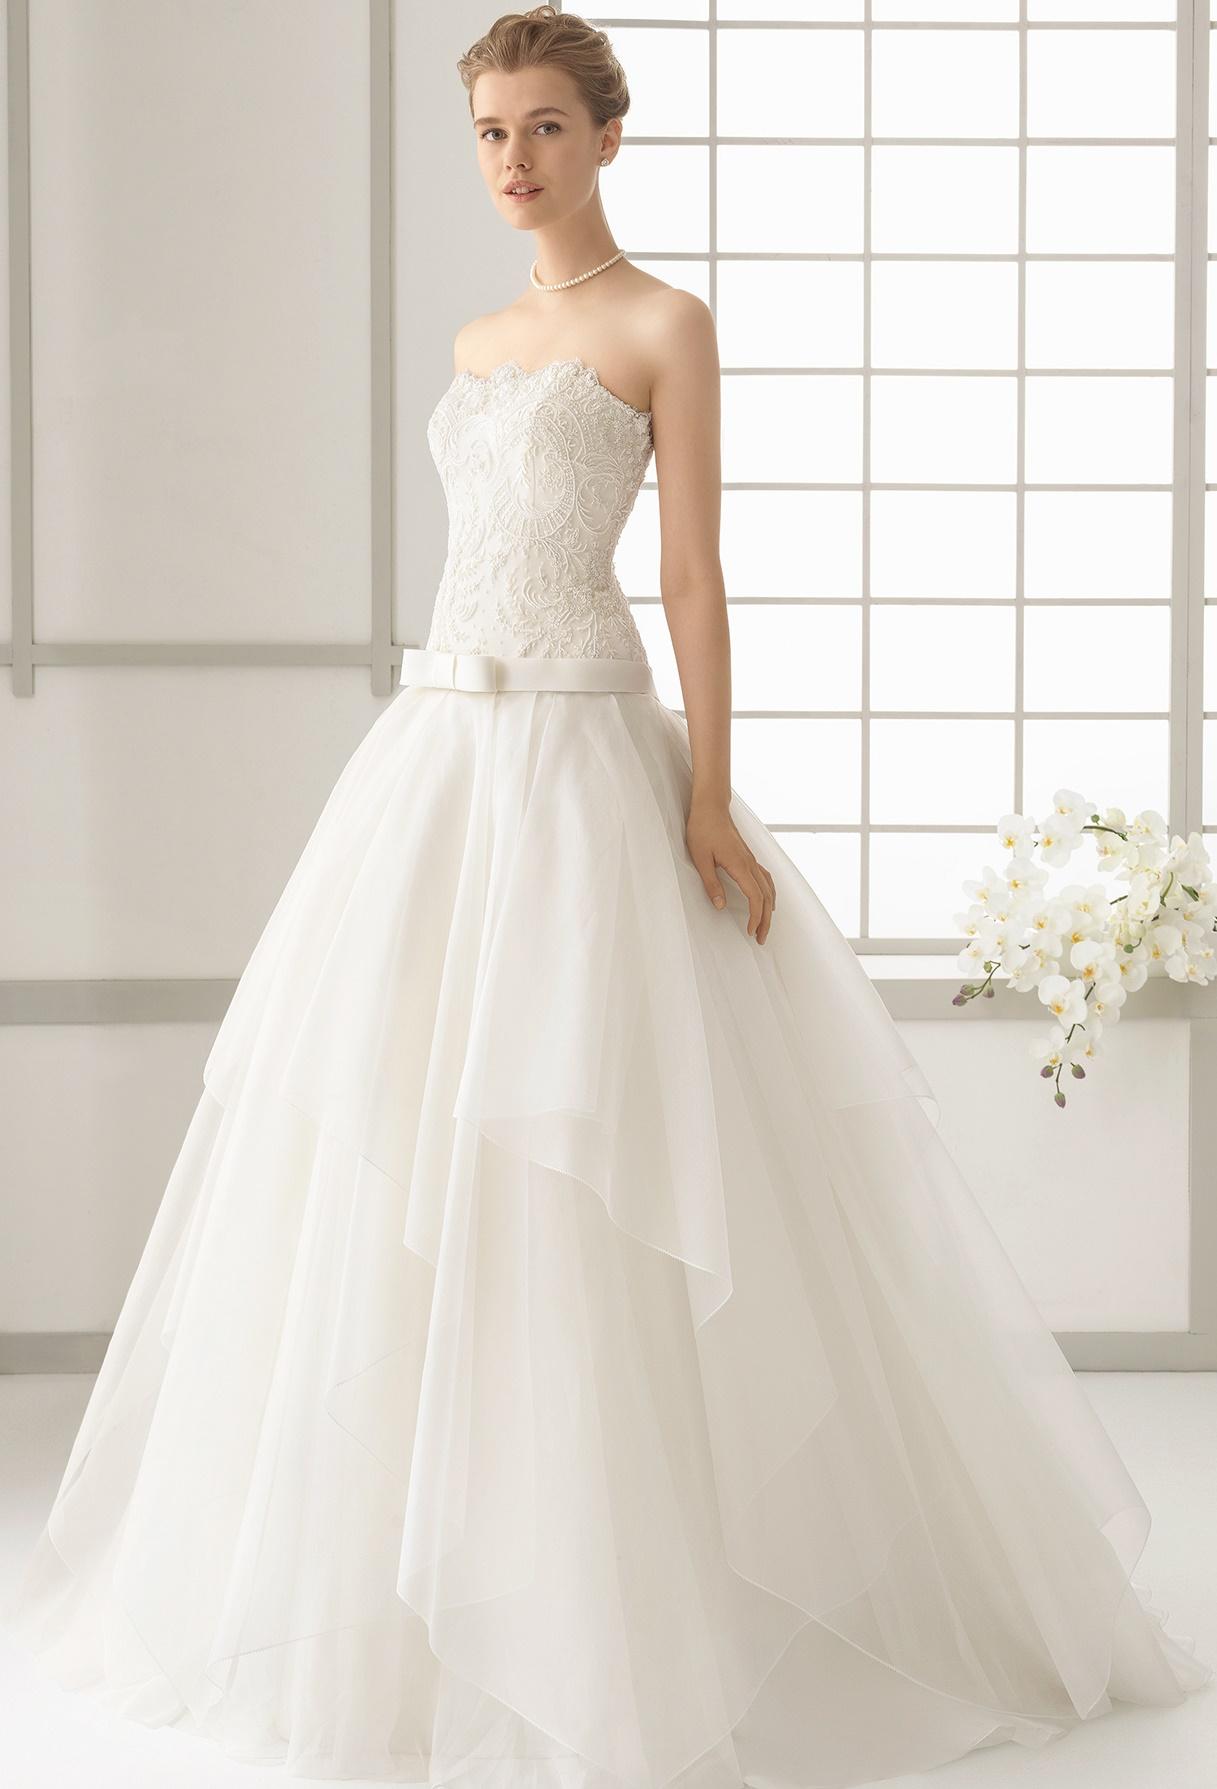 Rosa Clará7 - Vestidos de Noiva - Bridal Collection 2016